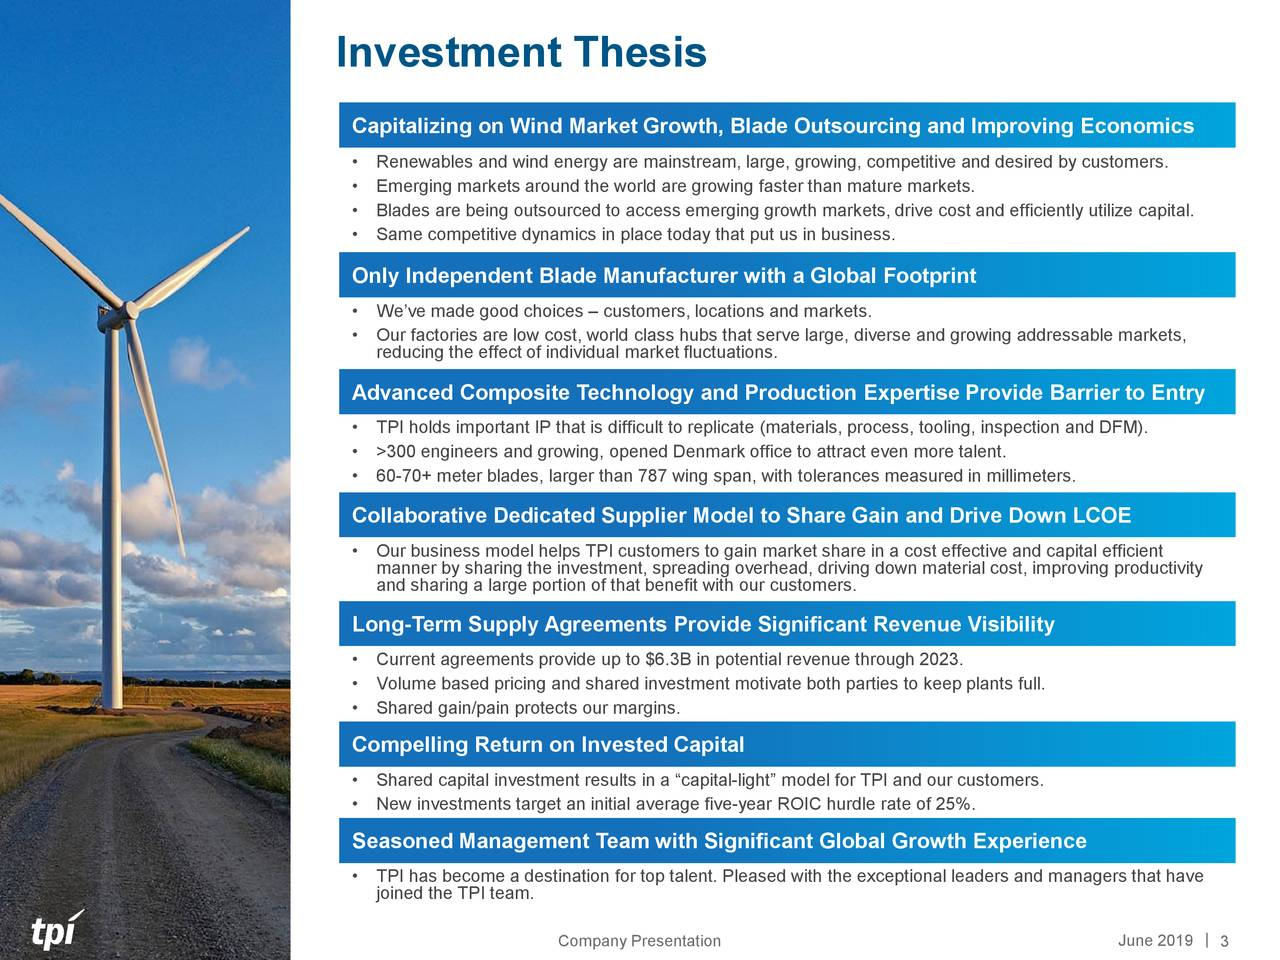 TPI Composites: Oversold Alternative Energy Play - TPI